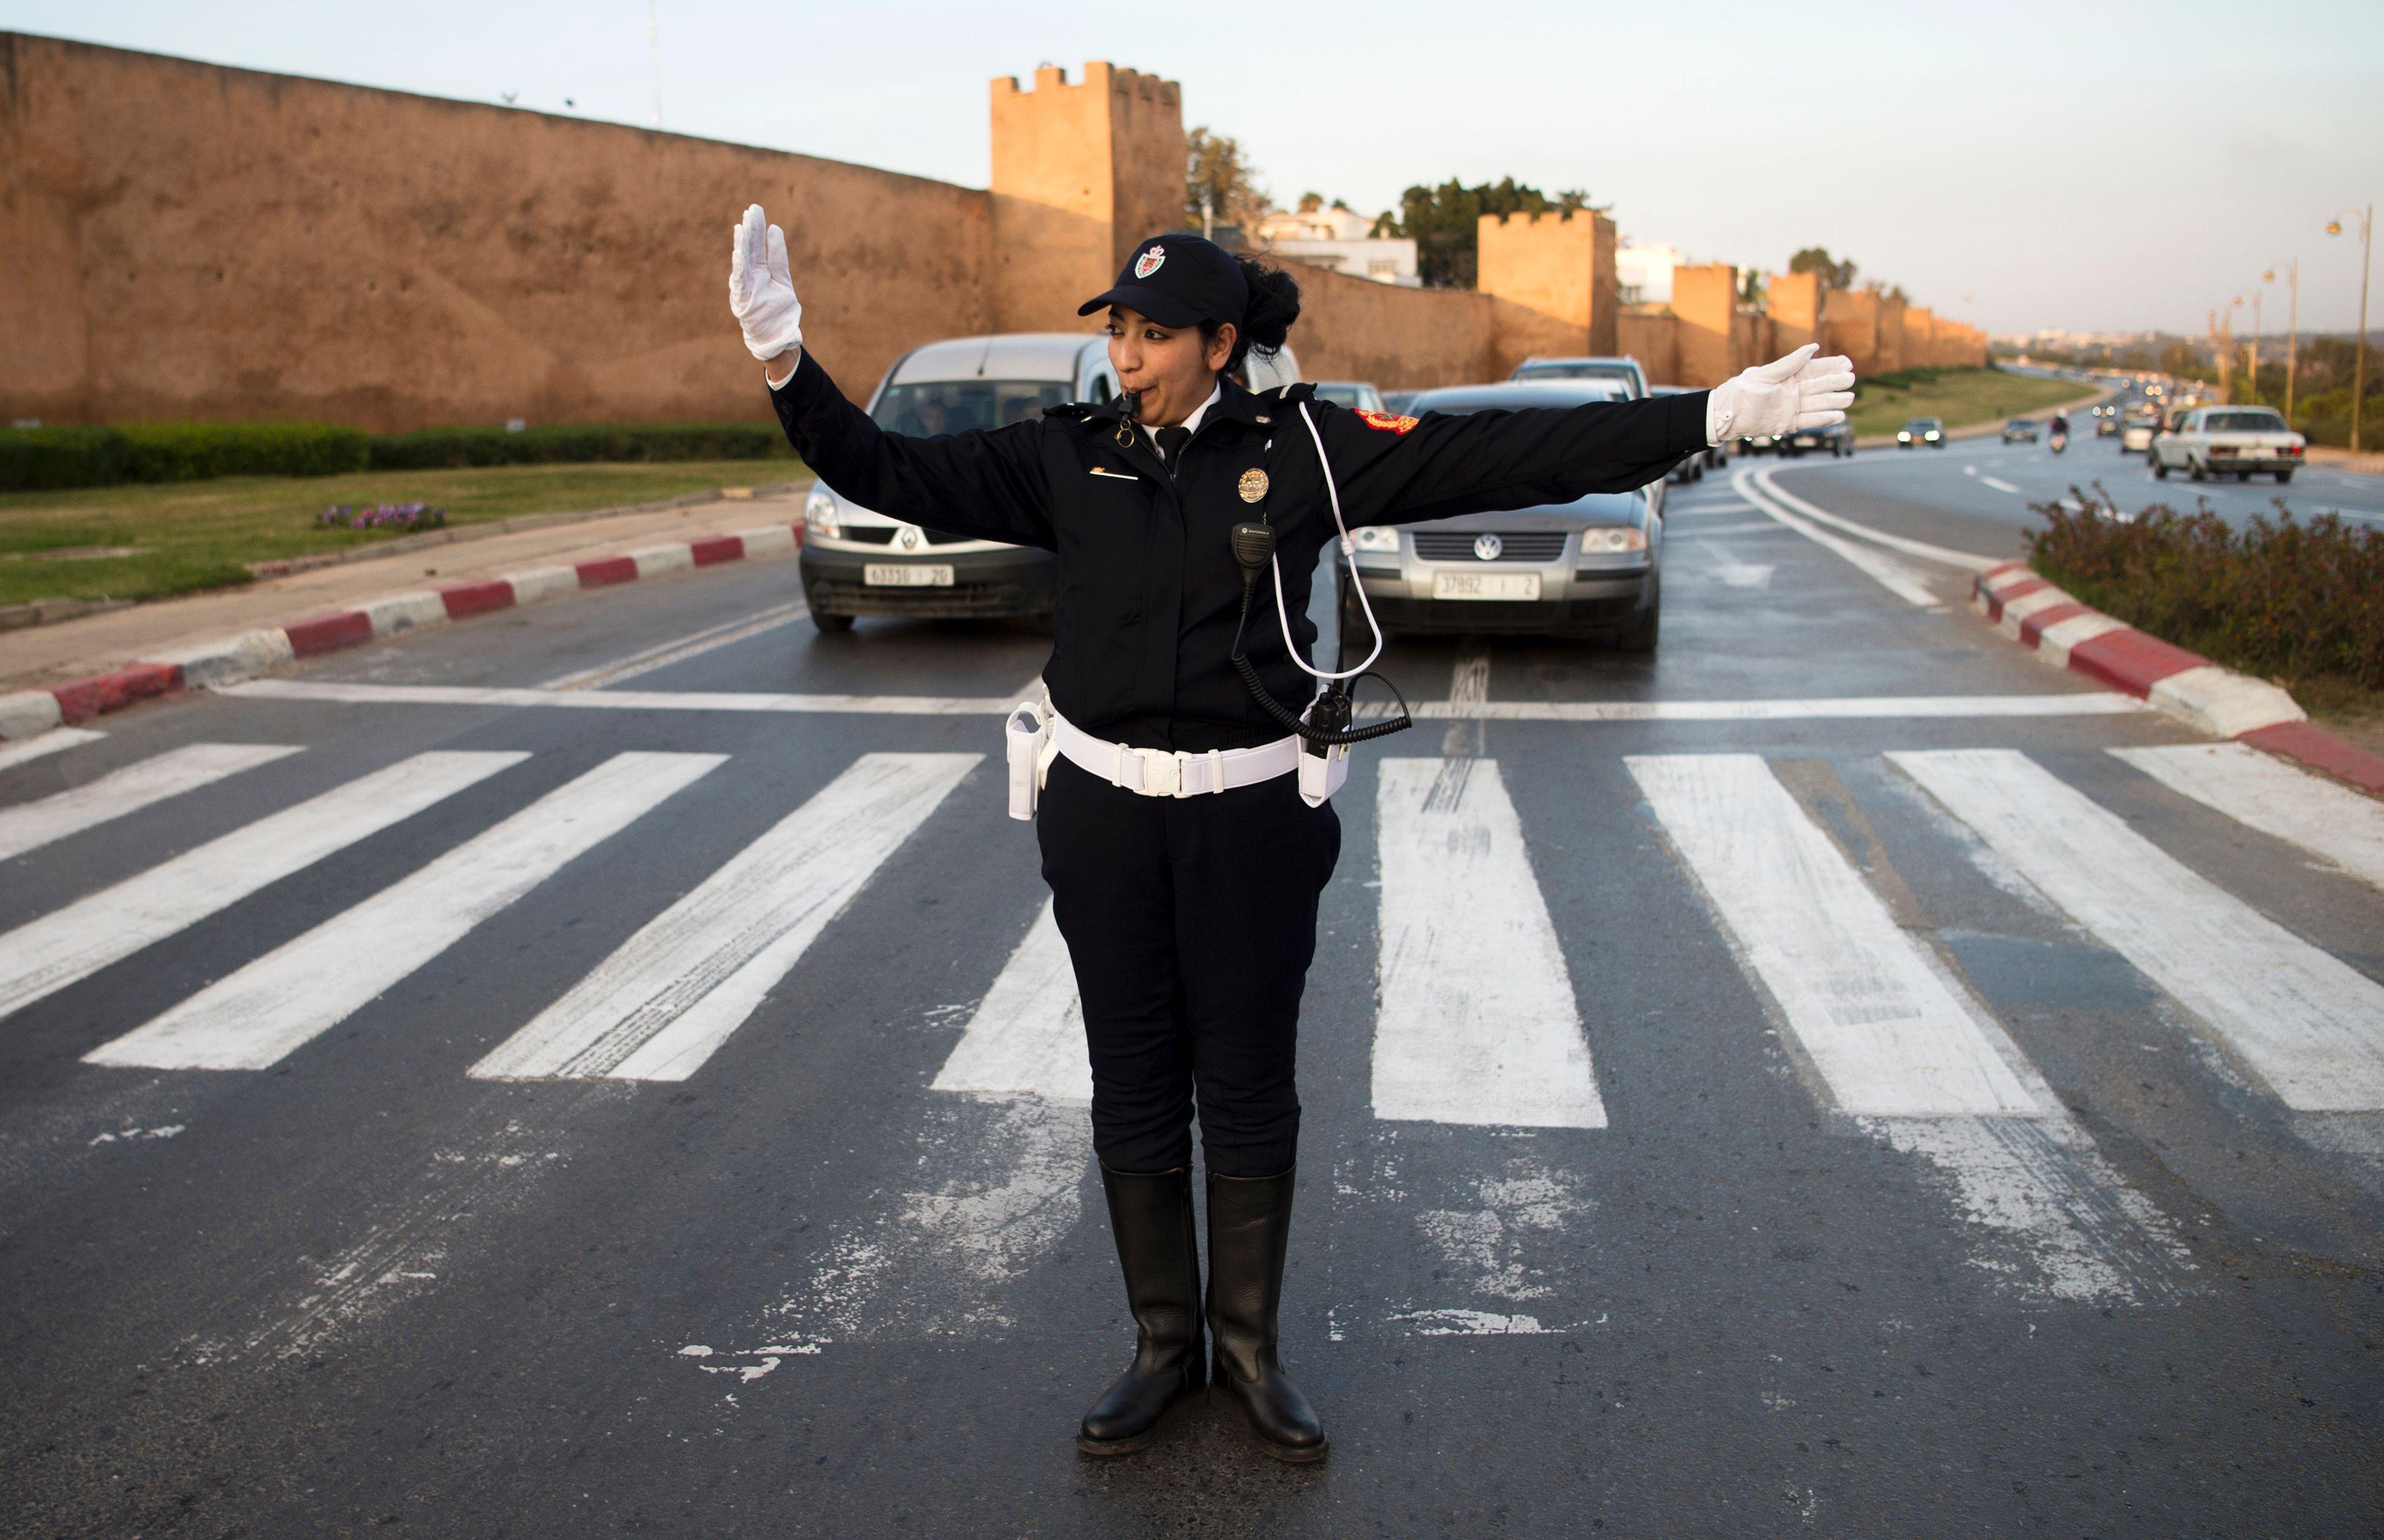 tout sur la police - Page 10 1044626-شرطية-مغربية